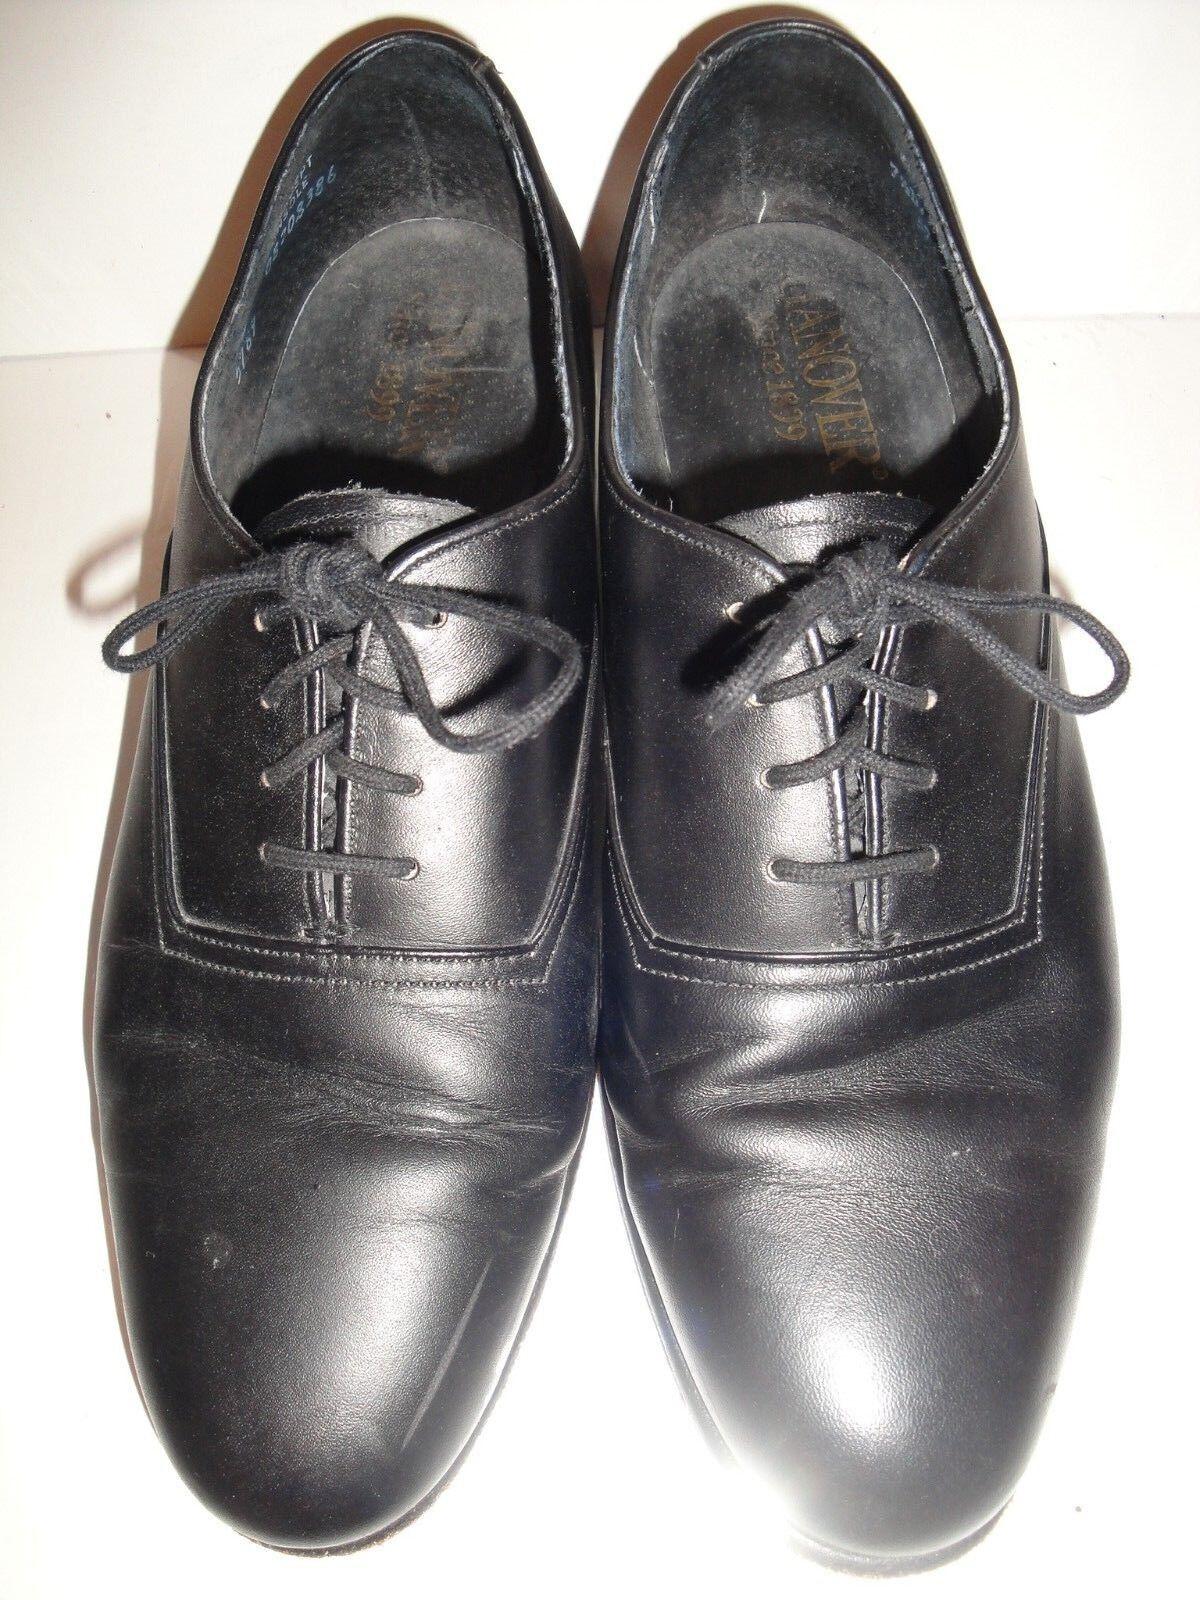 Hanover Vintage Black Leather Oxfords Men's shoes Size 7.5D B